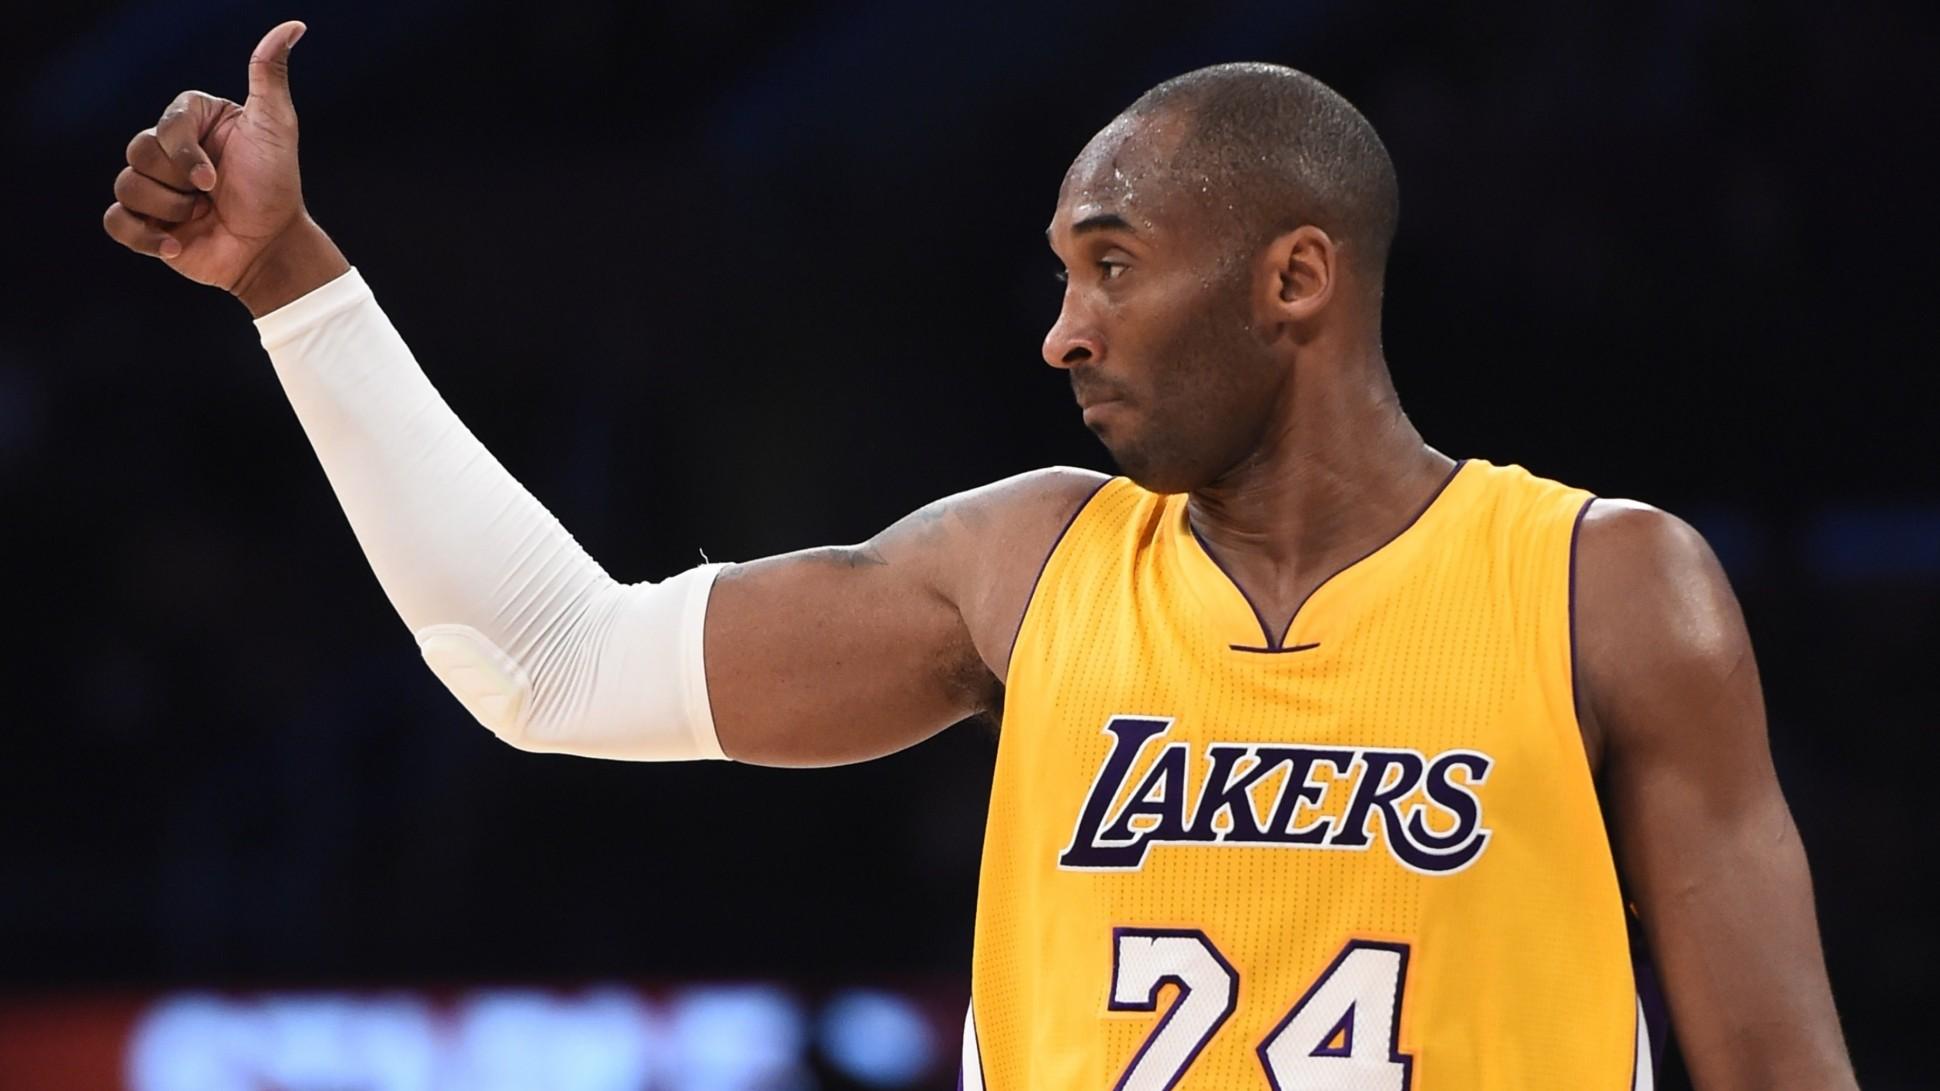 Will Not Play in 2016 Rio Olympics: Kobe Bryant